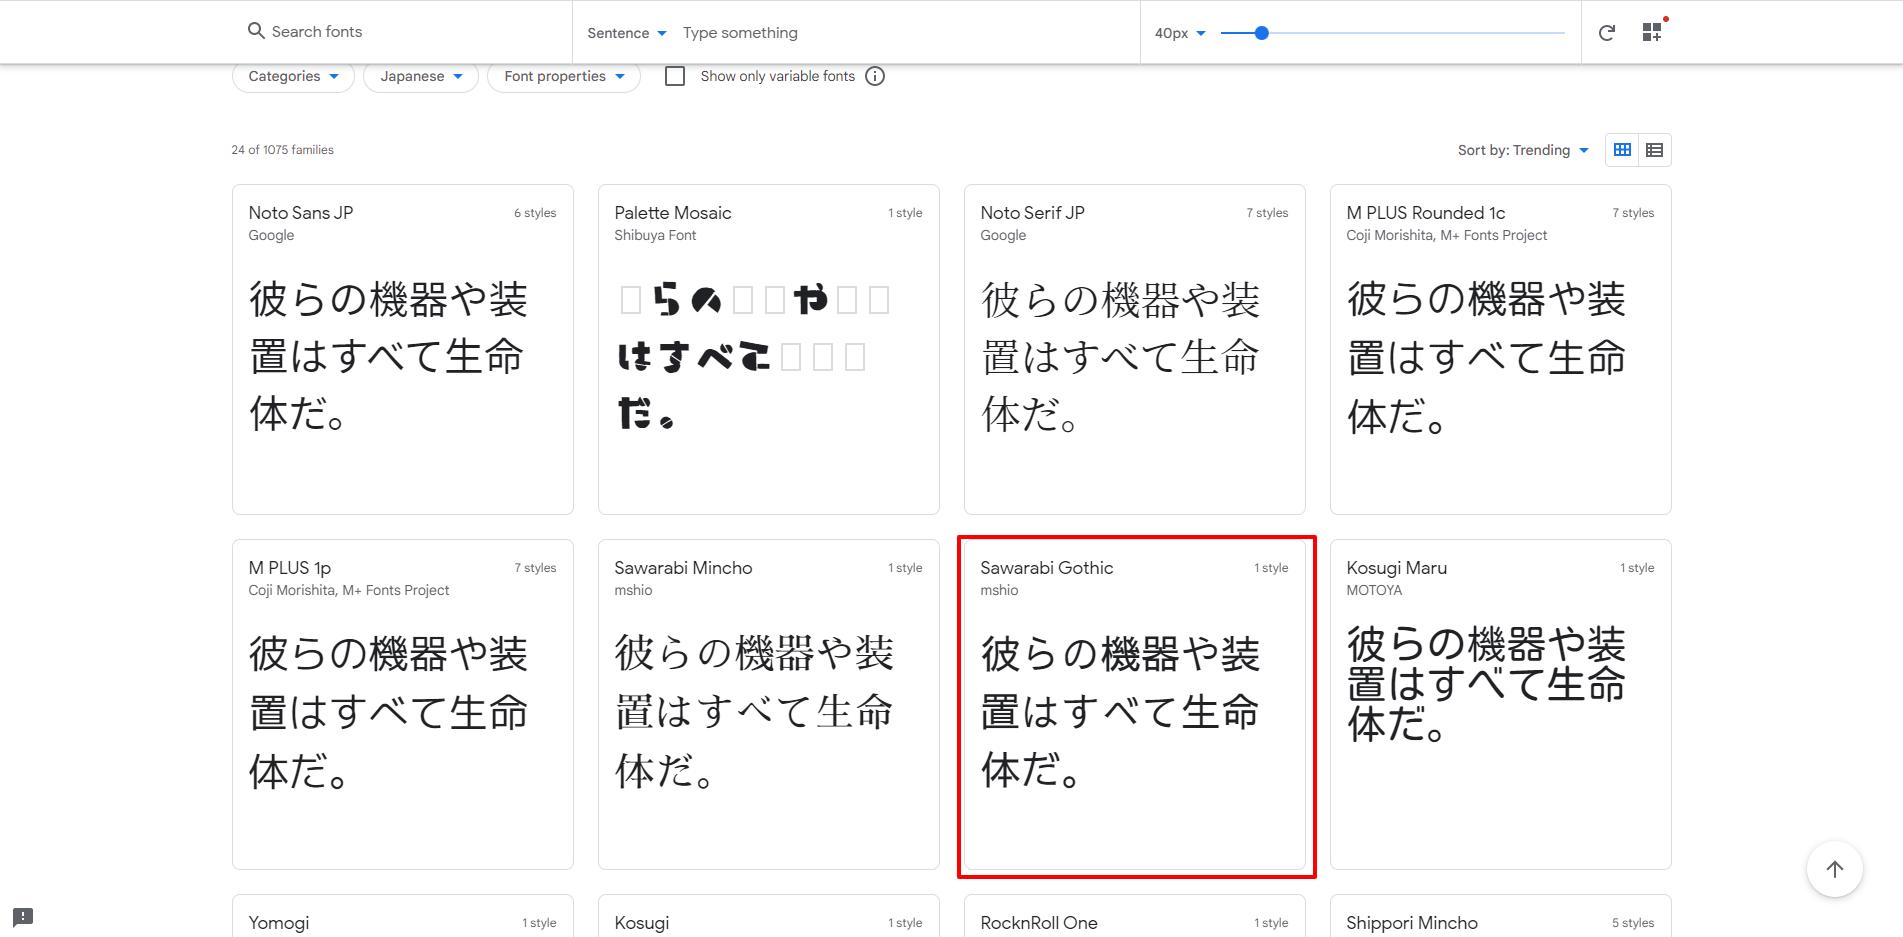 Google fontsから使いたいフォントを探し、フォント名を把握する。